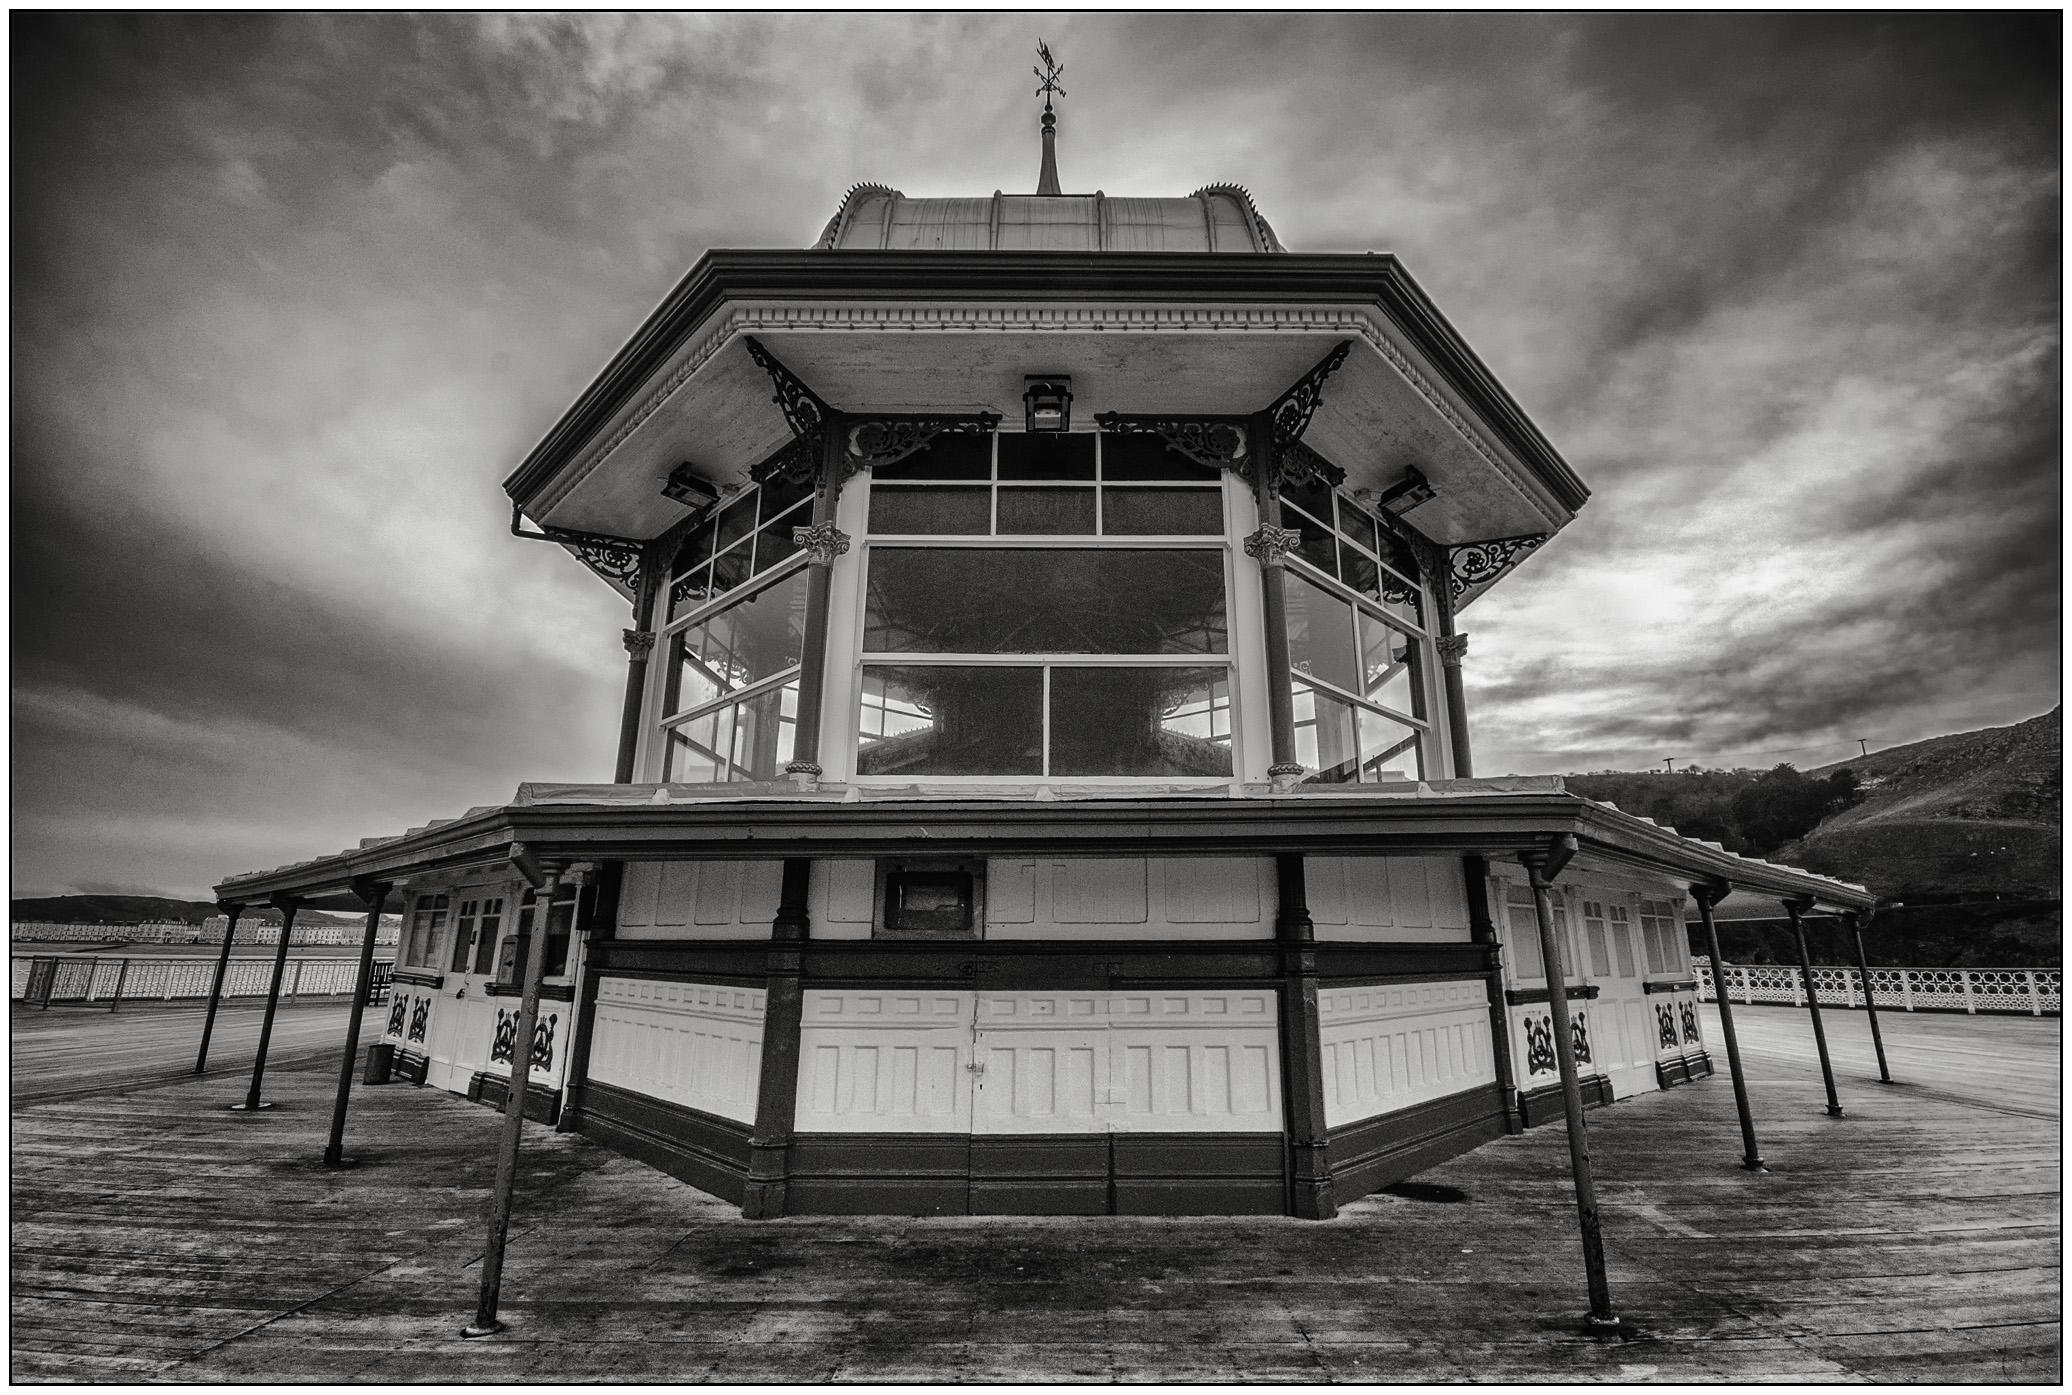 The Pavilion, Llandudno Pier